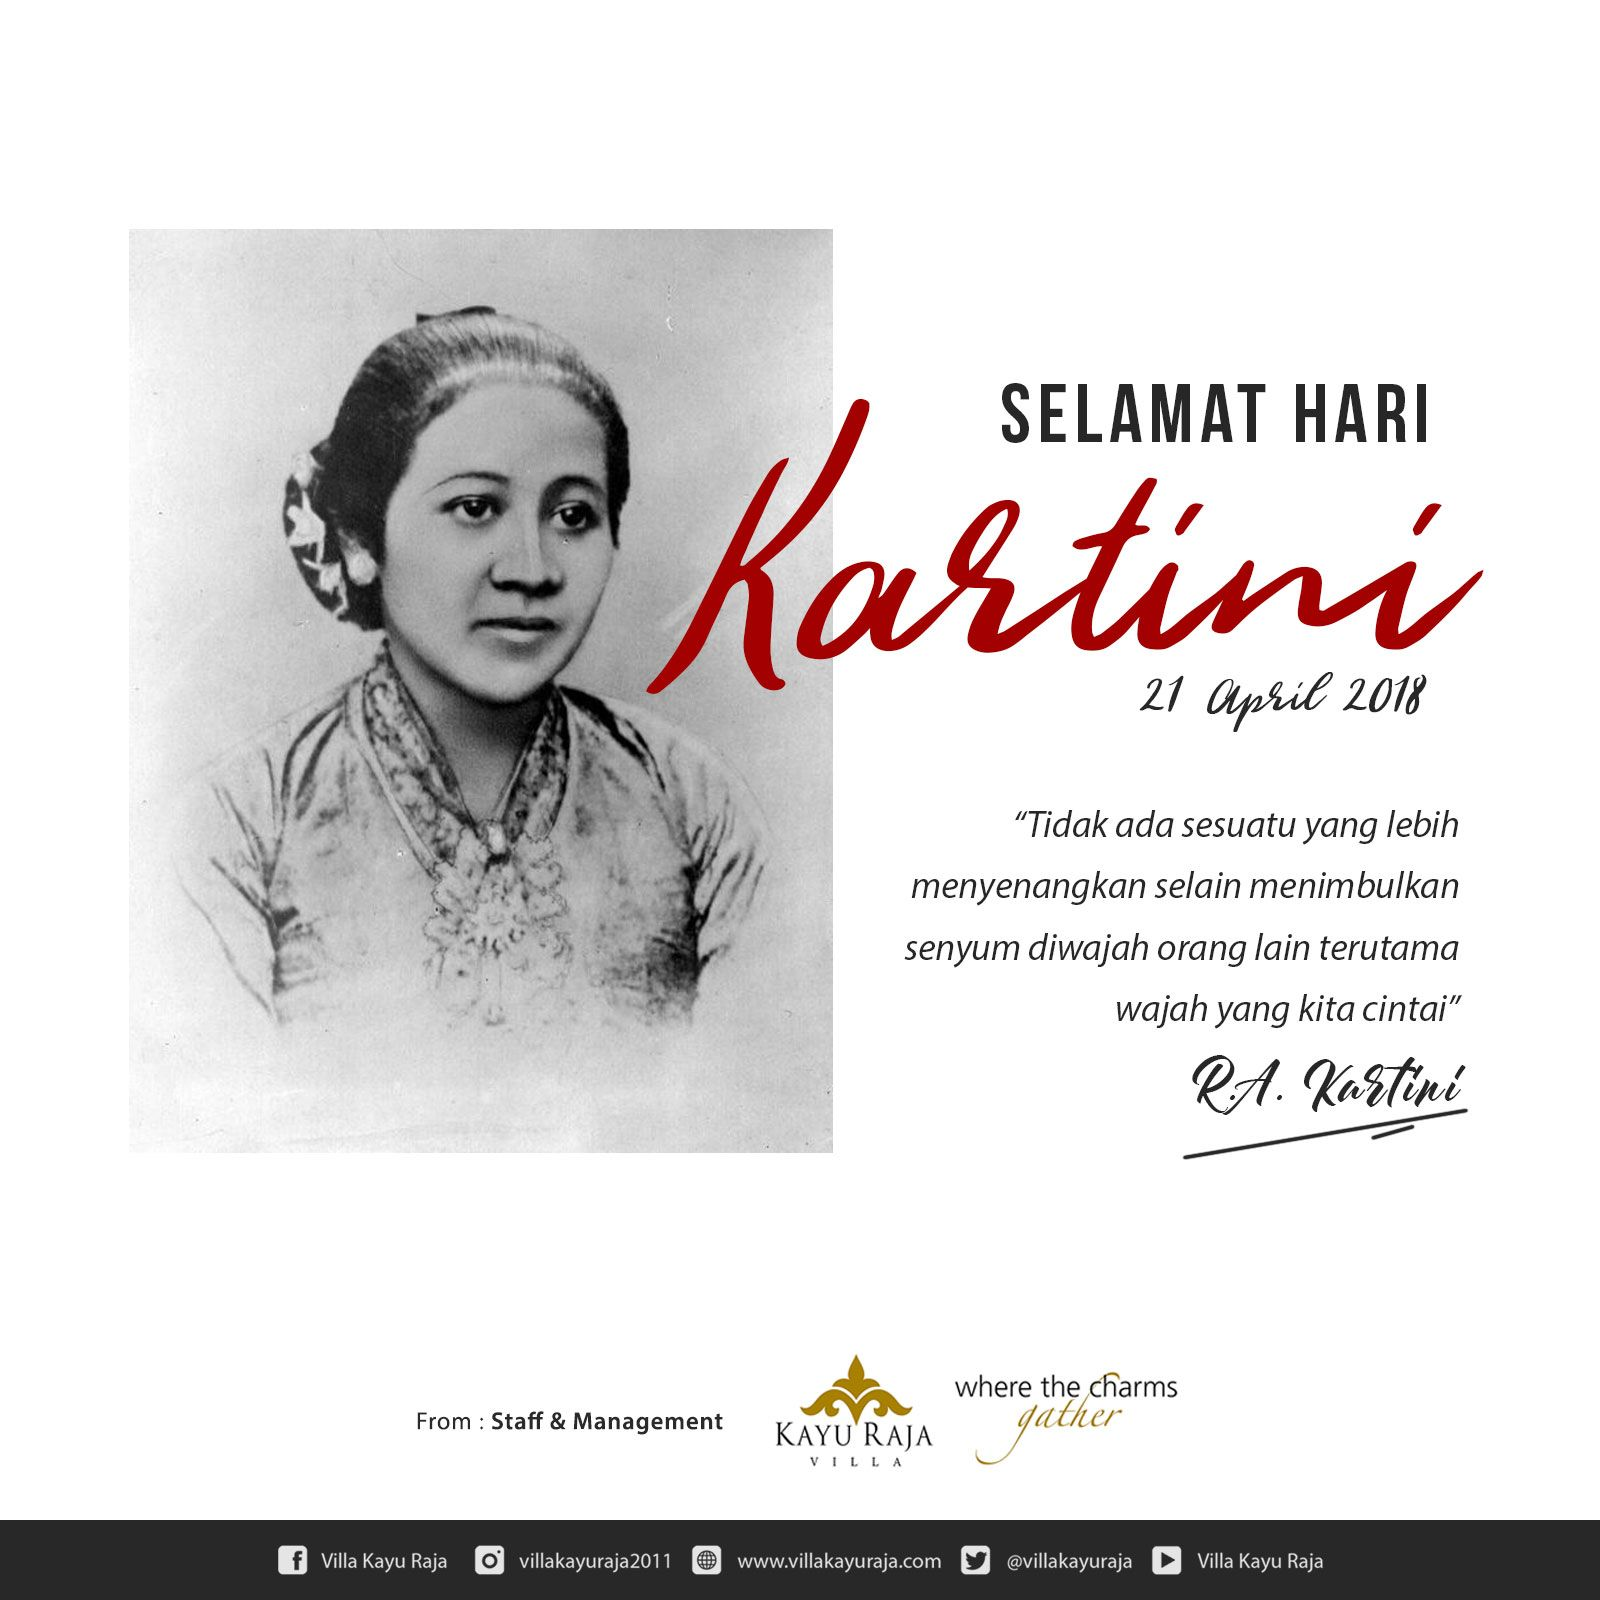 Gambar Pahlawan Nasional Kartini